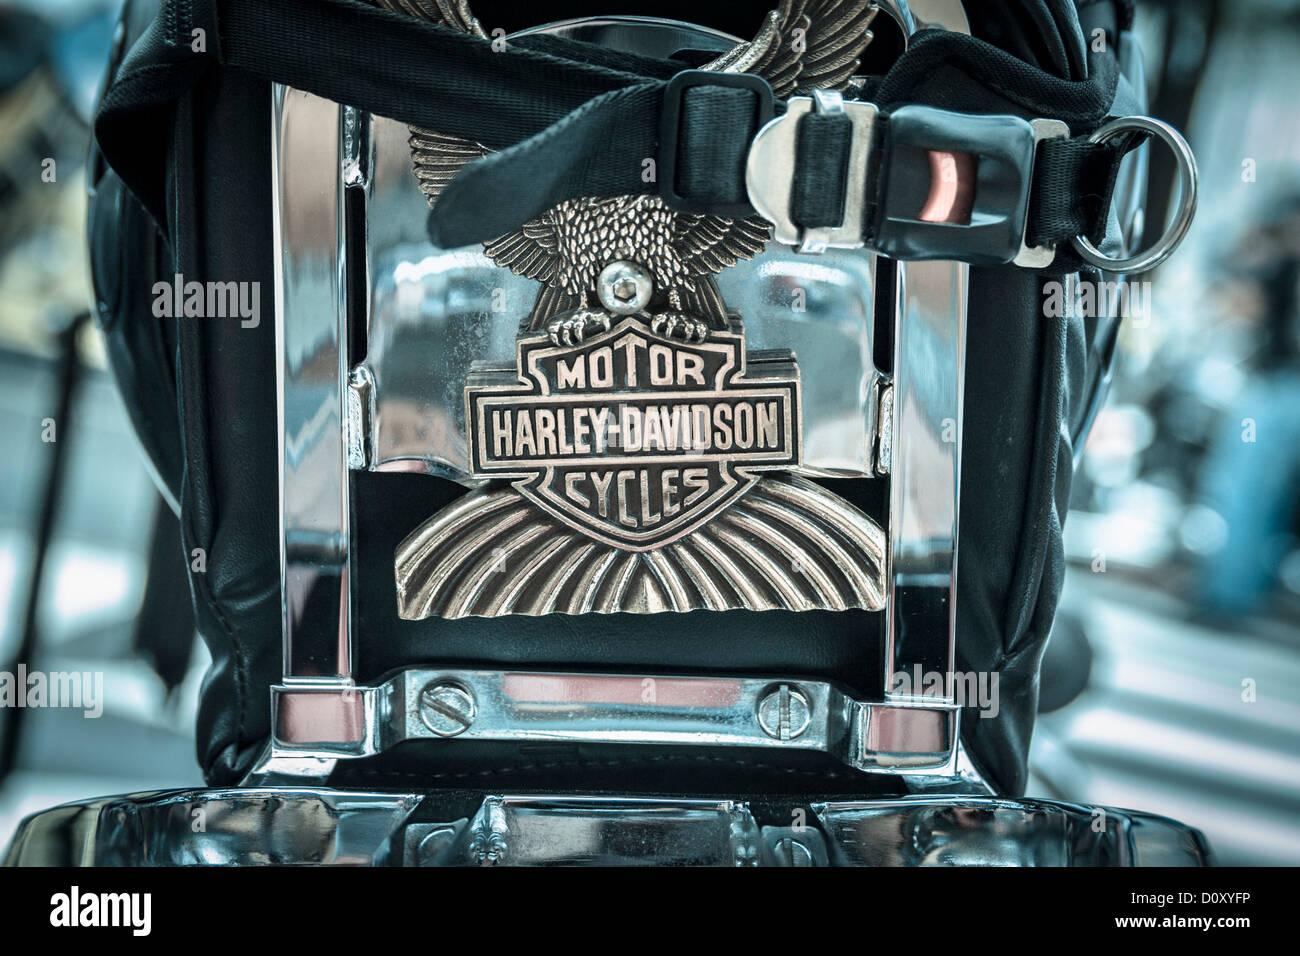 Helmut on seat of Harley Davidson motorbike - Stock Image